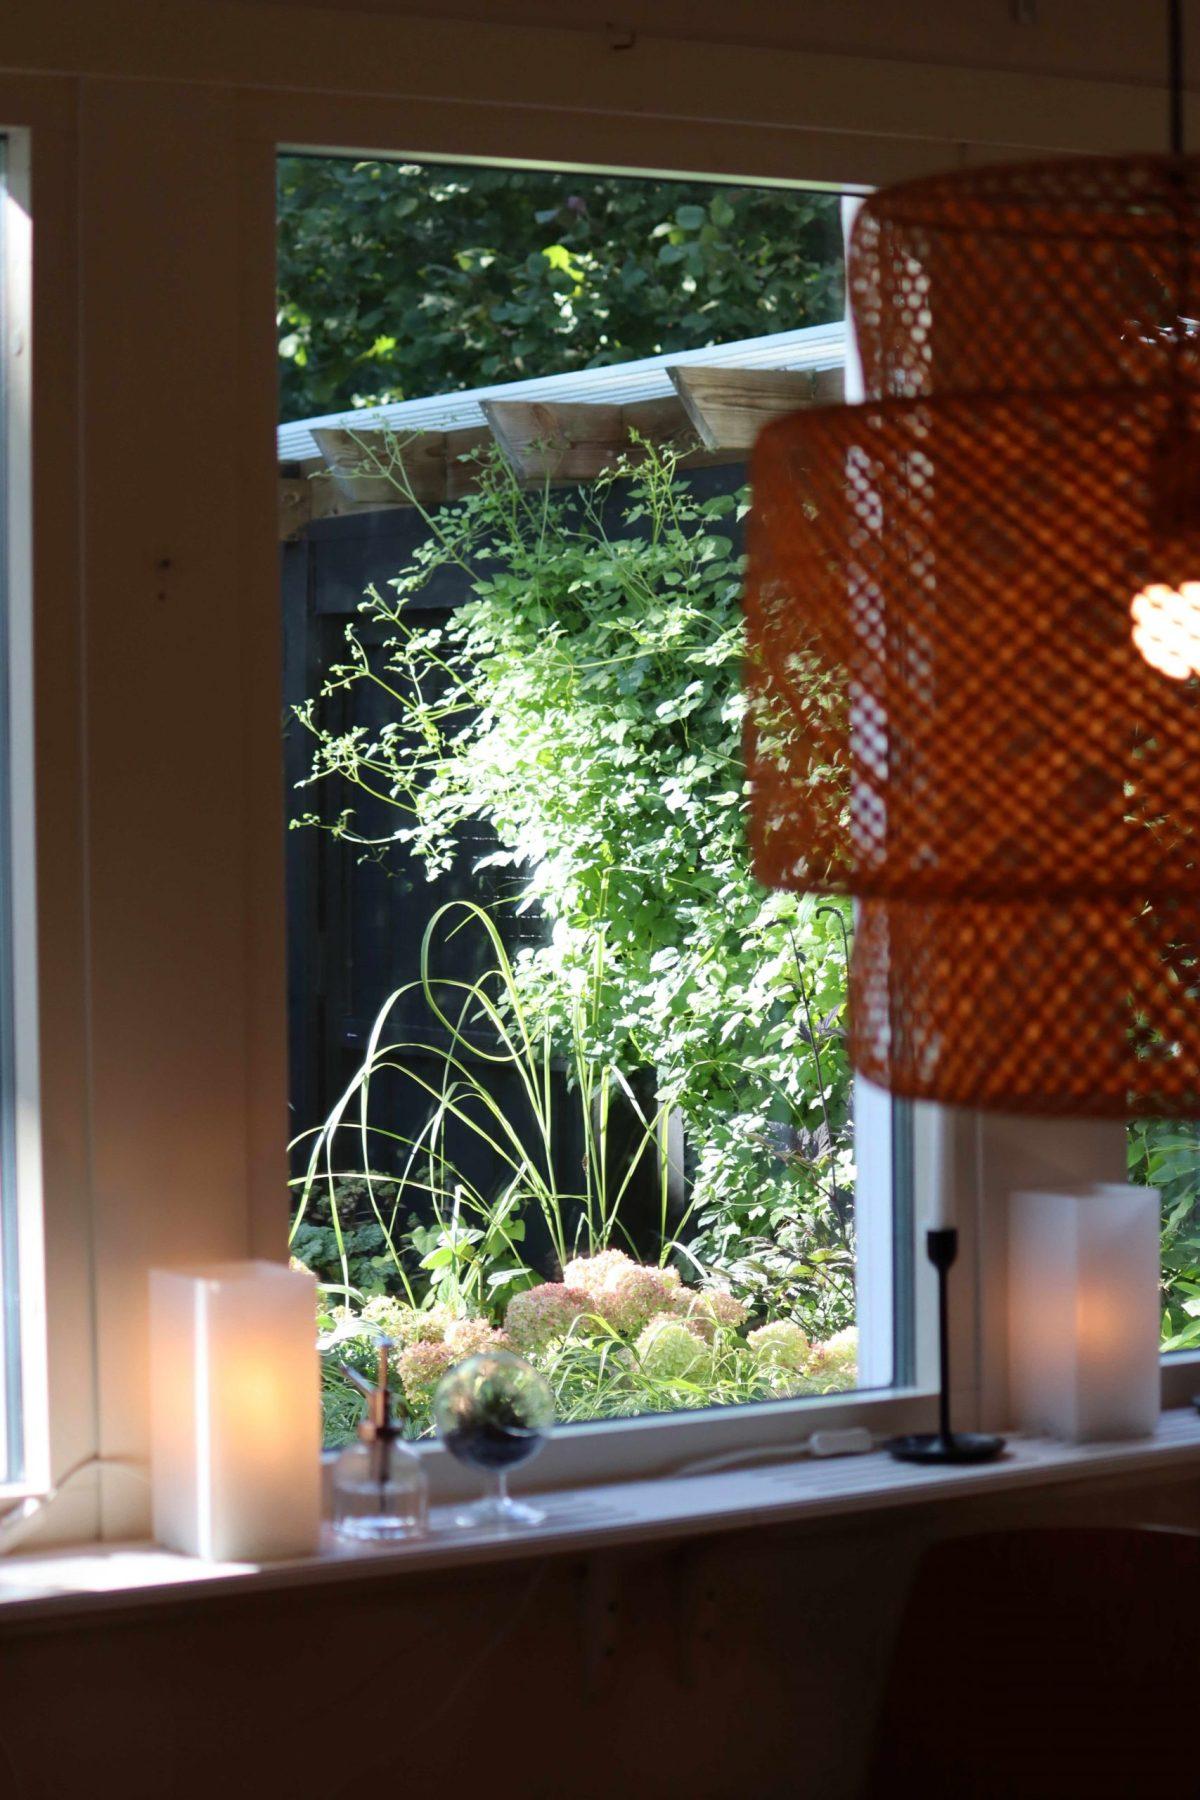 Natalia Lindberg Trädgårdsdesign - augustiljus i trädgården Hortensia Little Lime  höstsilverax hakonegräs